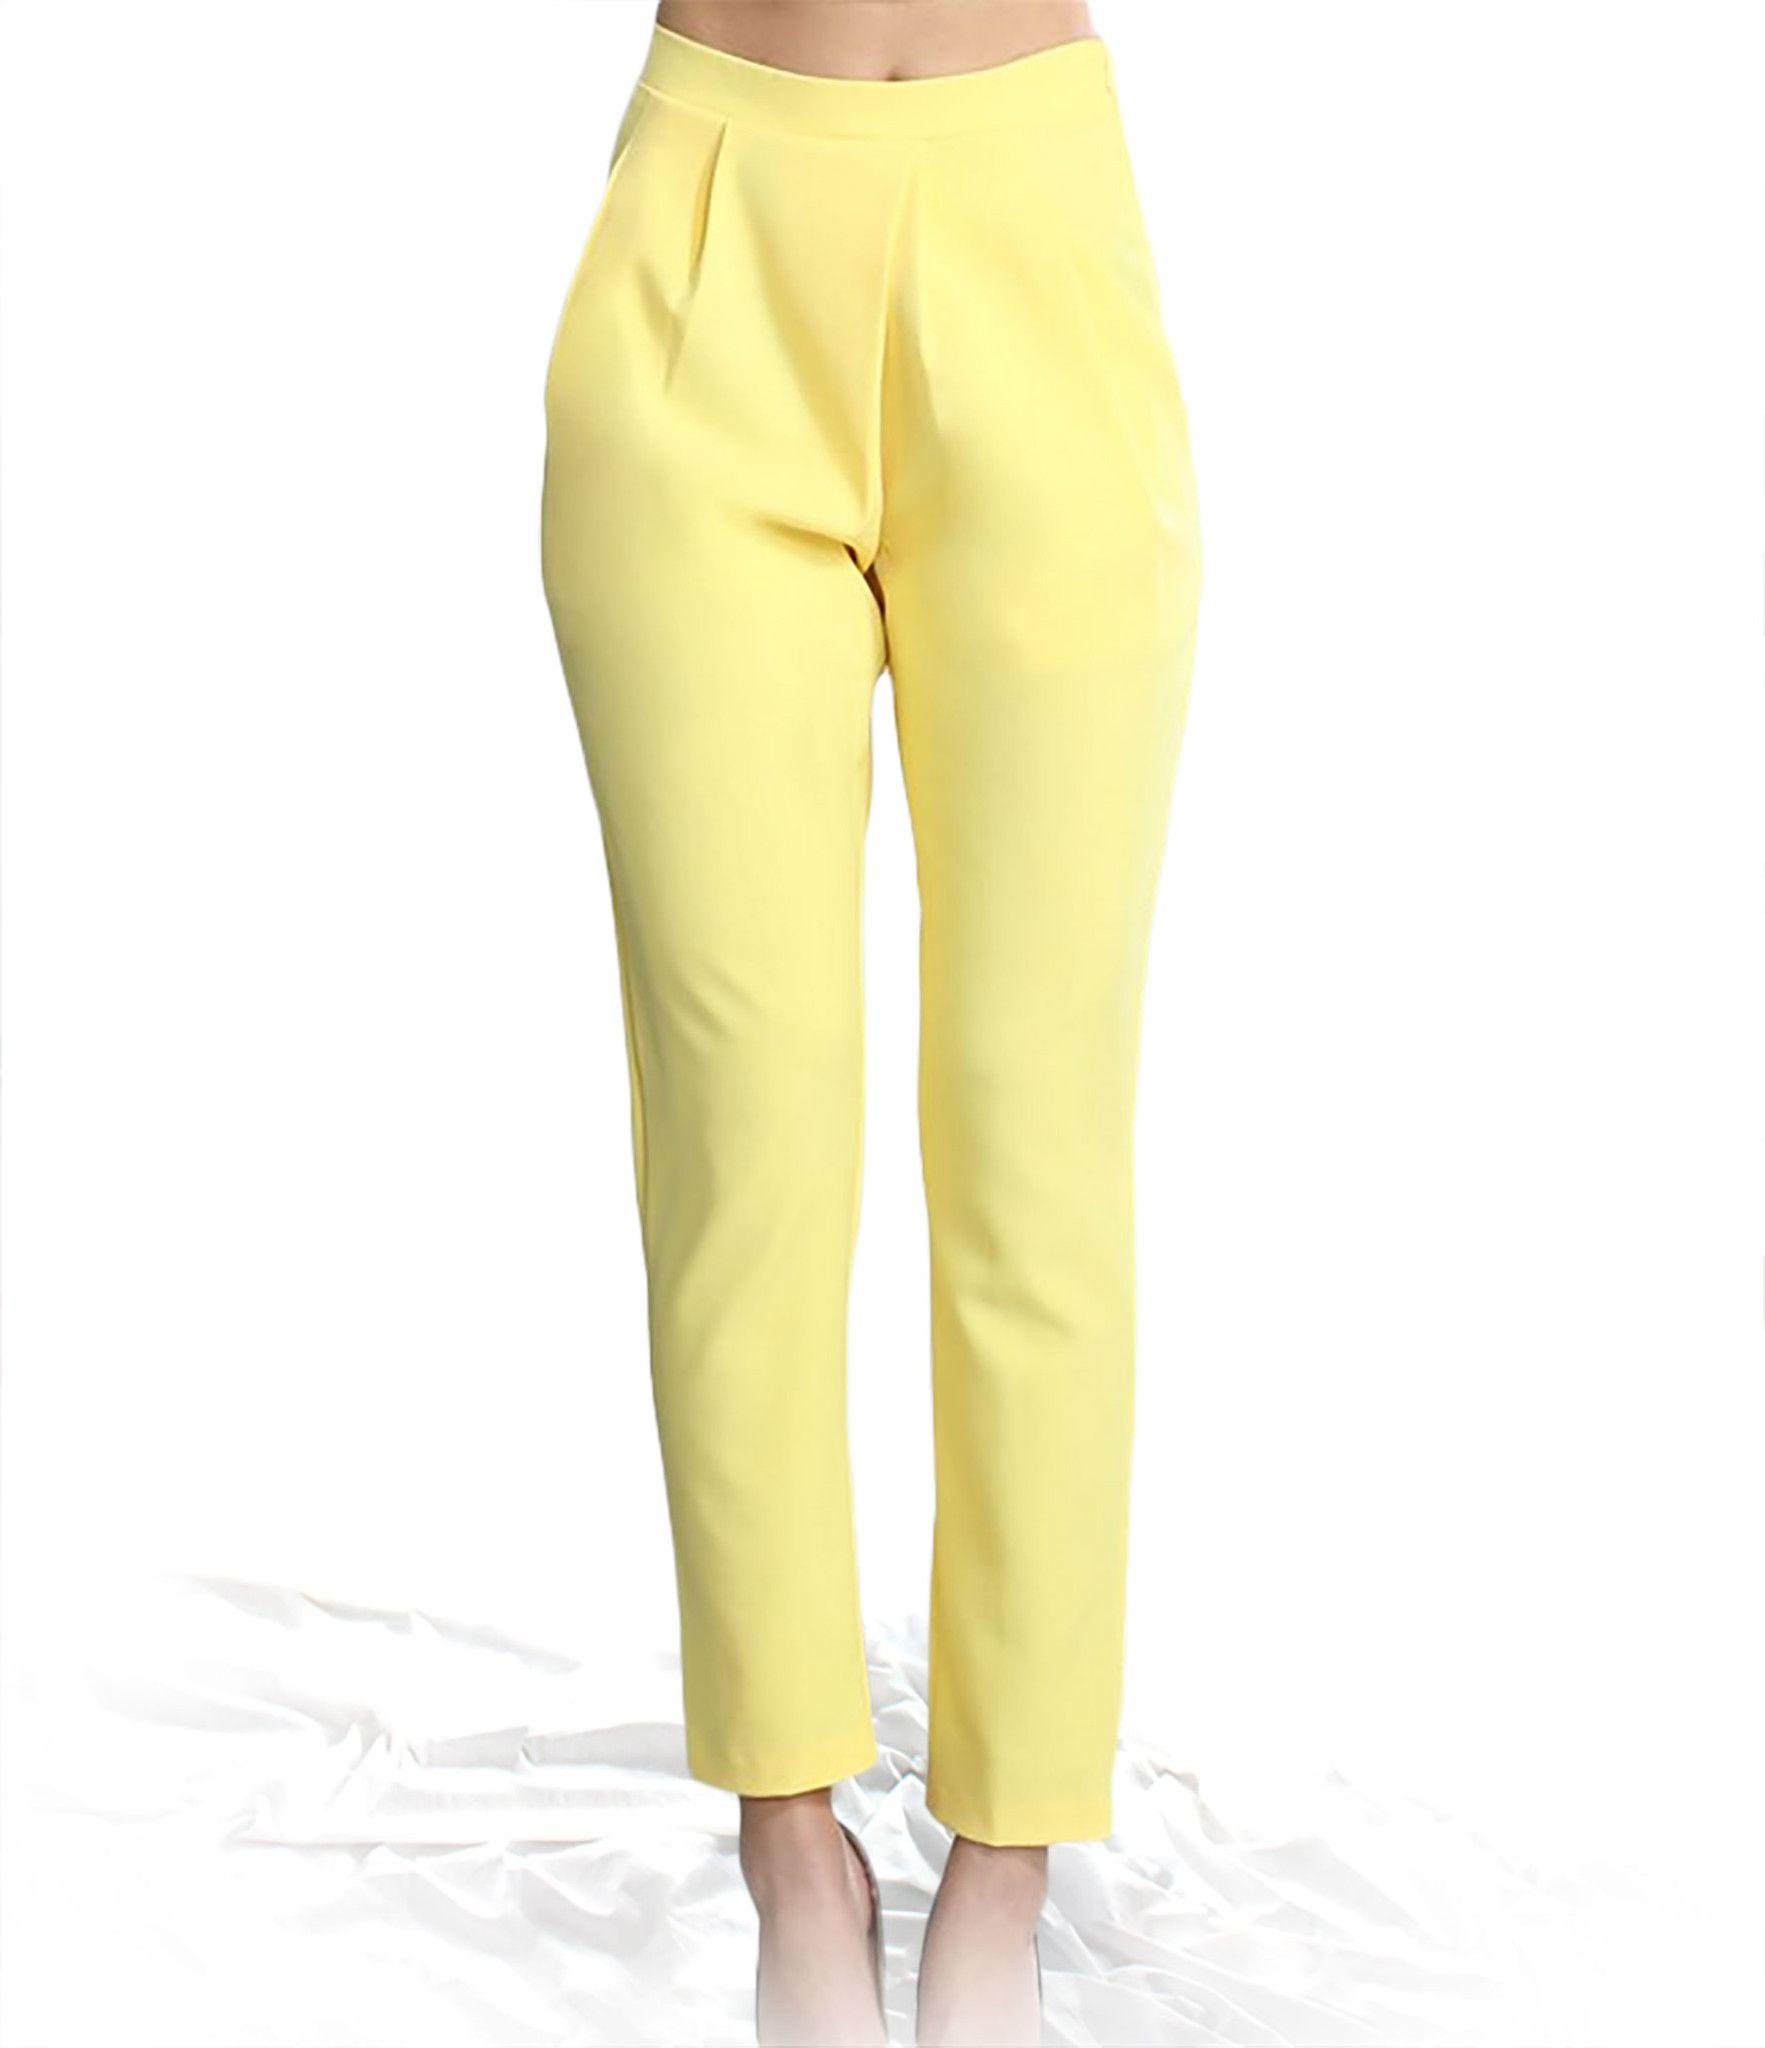 Modern vintage yellow Cigarette Pants from Theadora Vintage. Shop theadoravintage.com